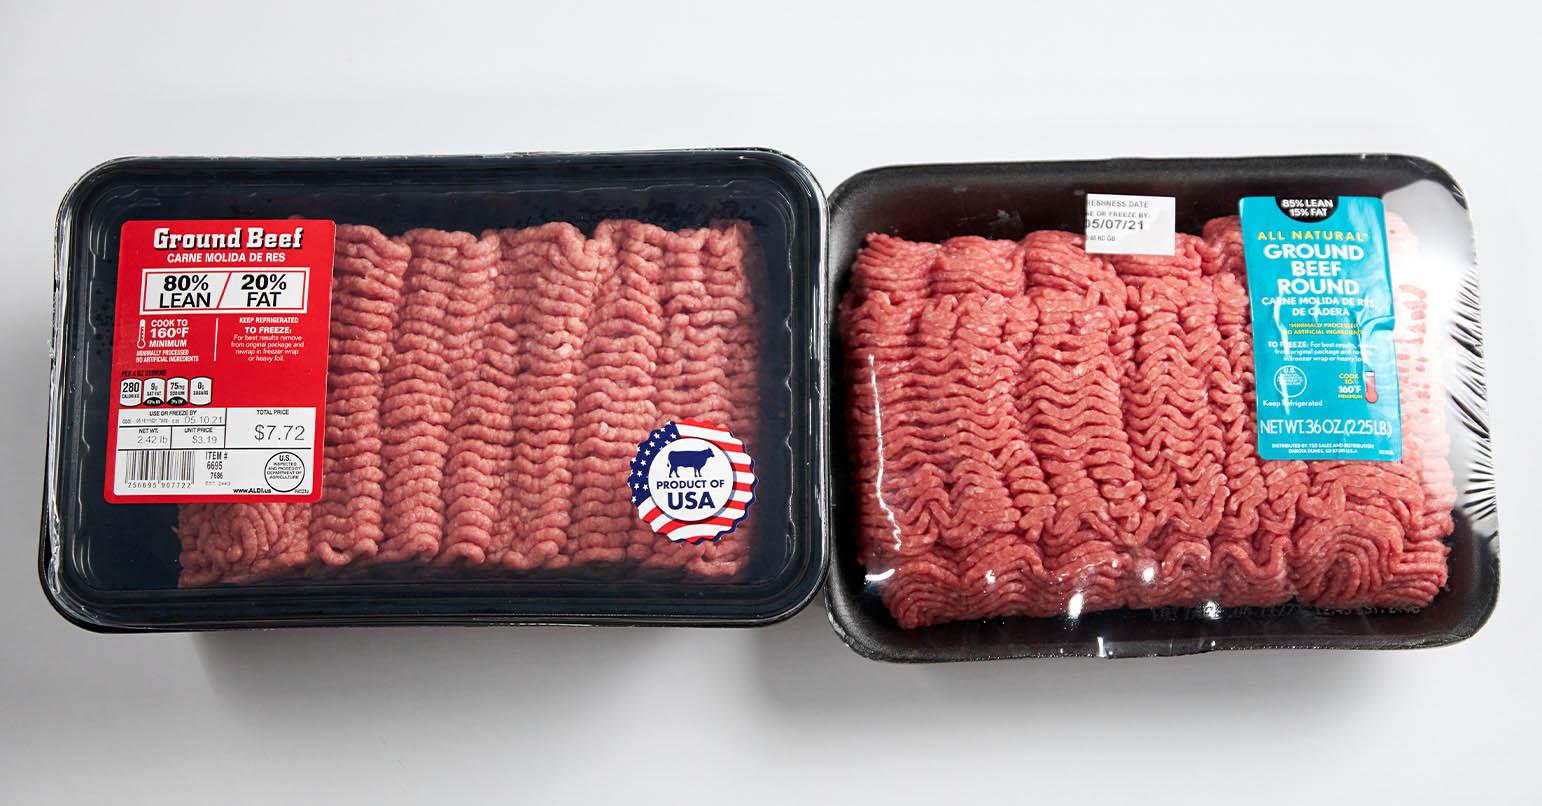 Aldi vs Walmart Ground Beef